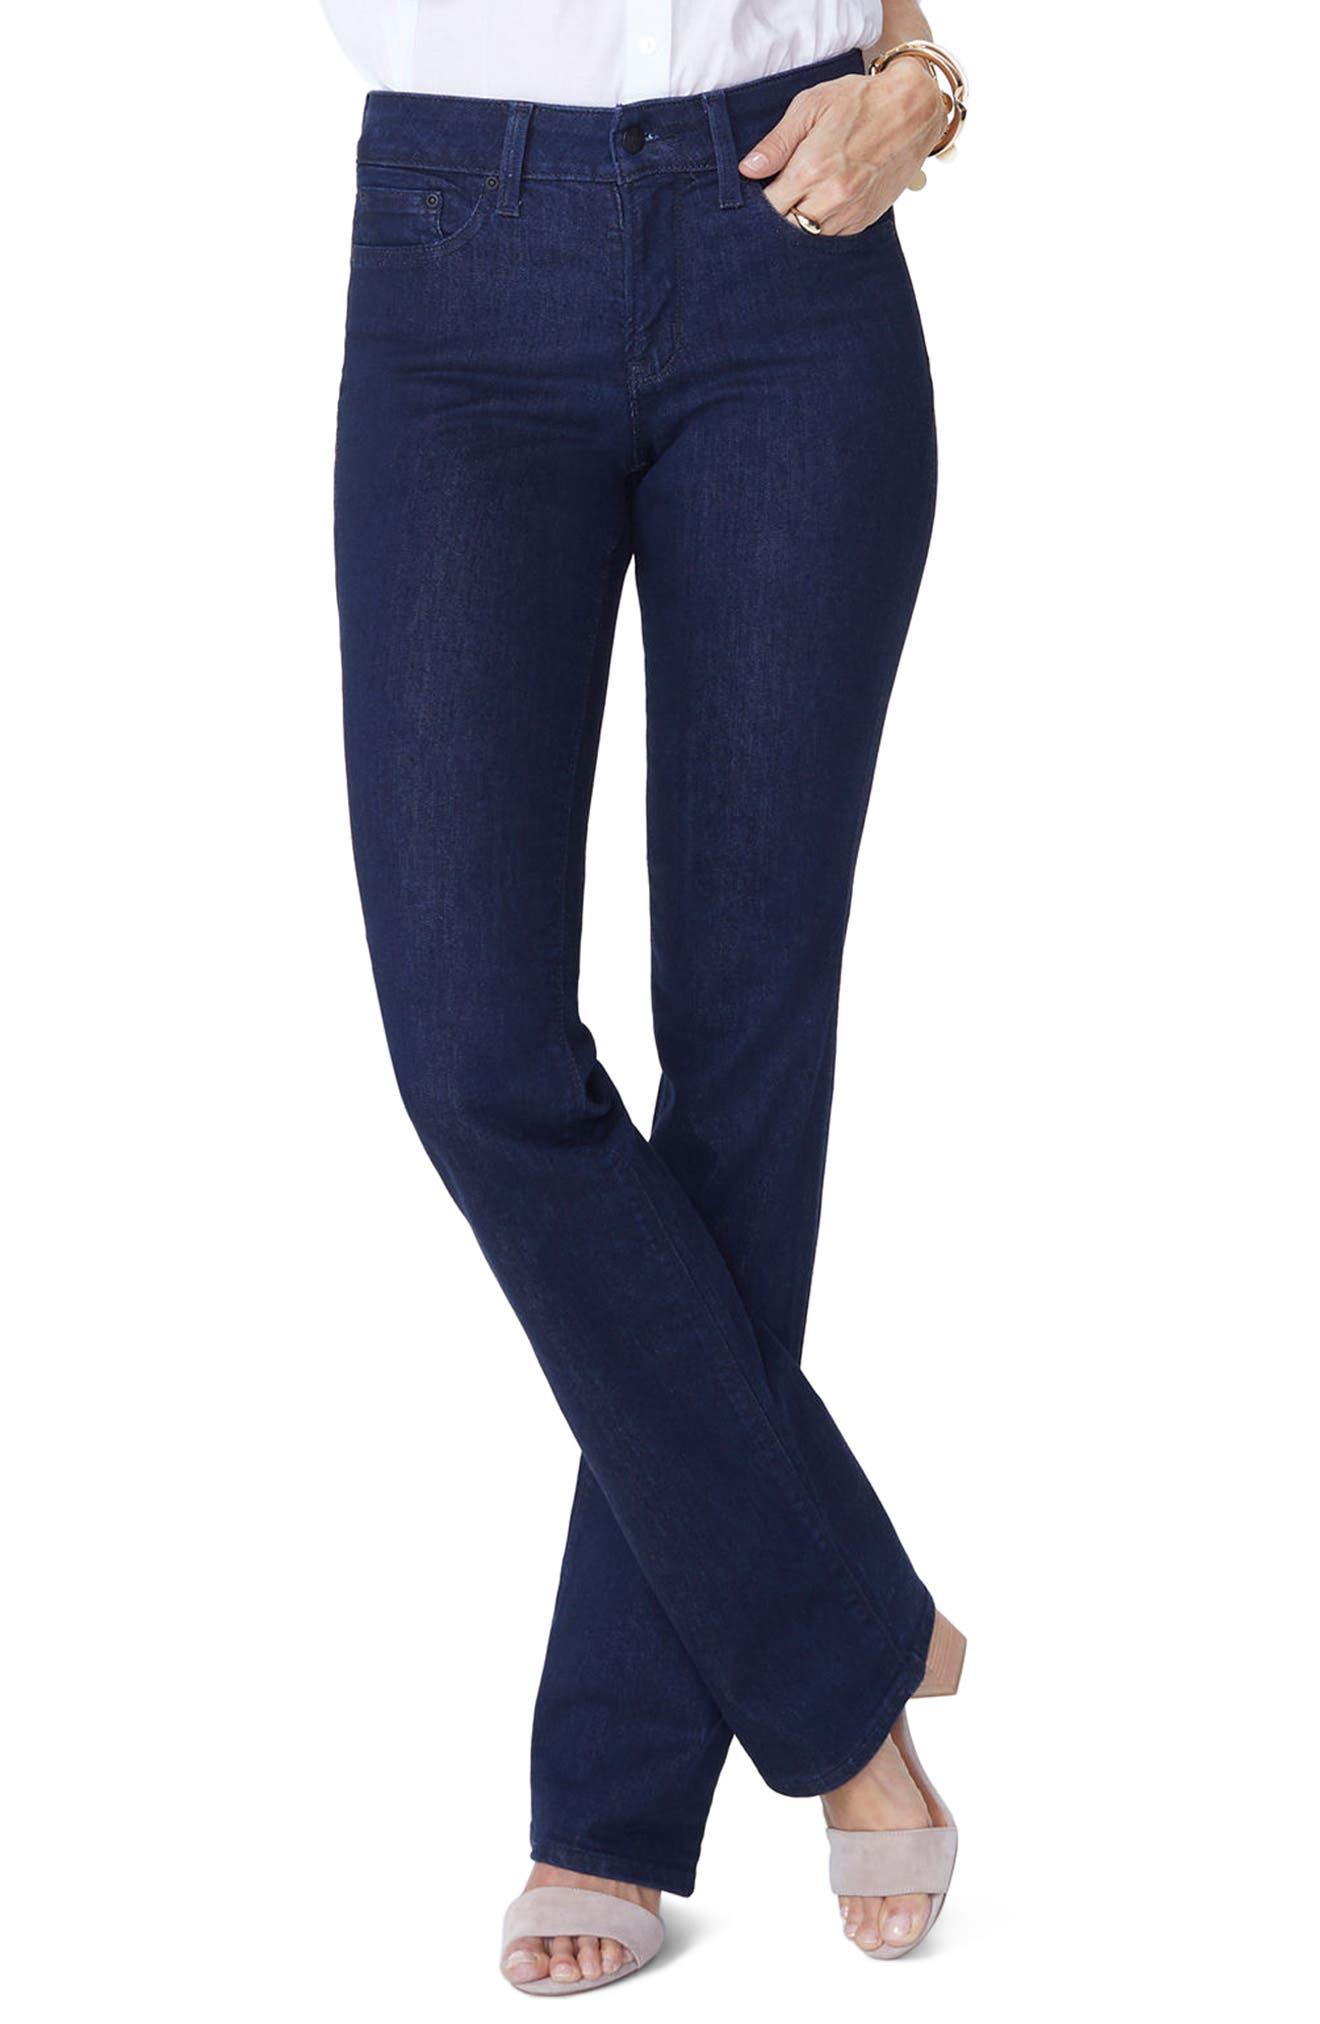 NYDJ, Barbara High Waist Stretch Bootcut Jeans, Main thumbnail 1, color, RINSE